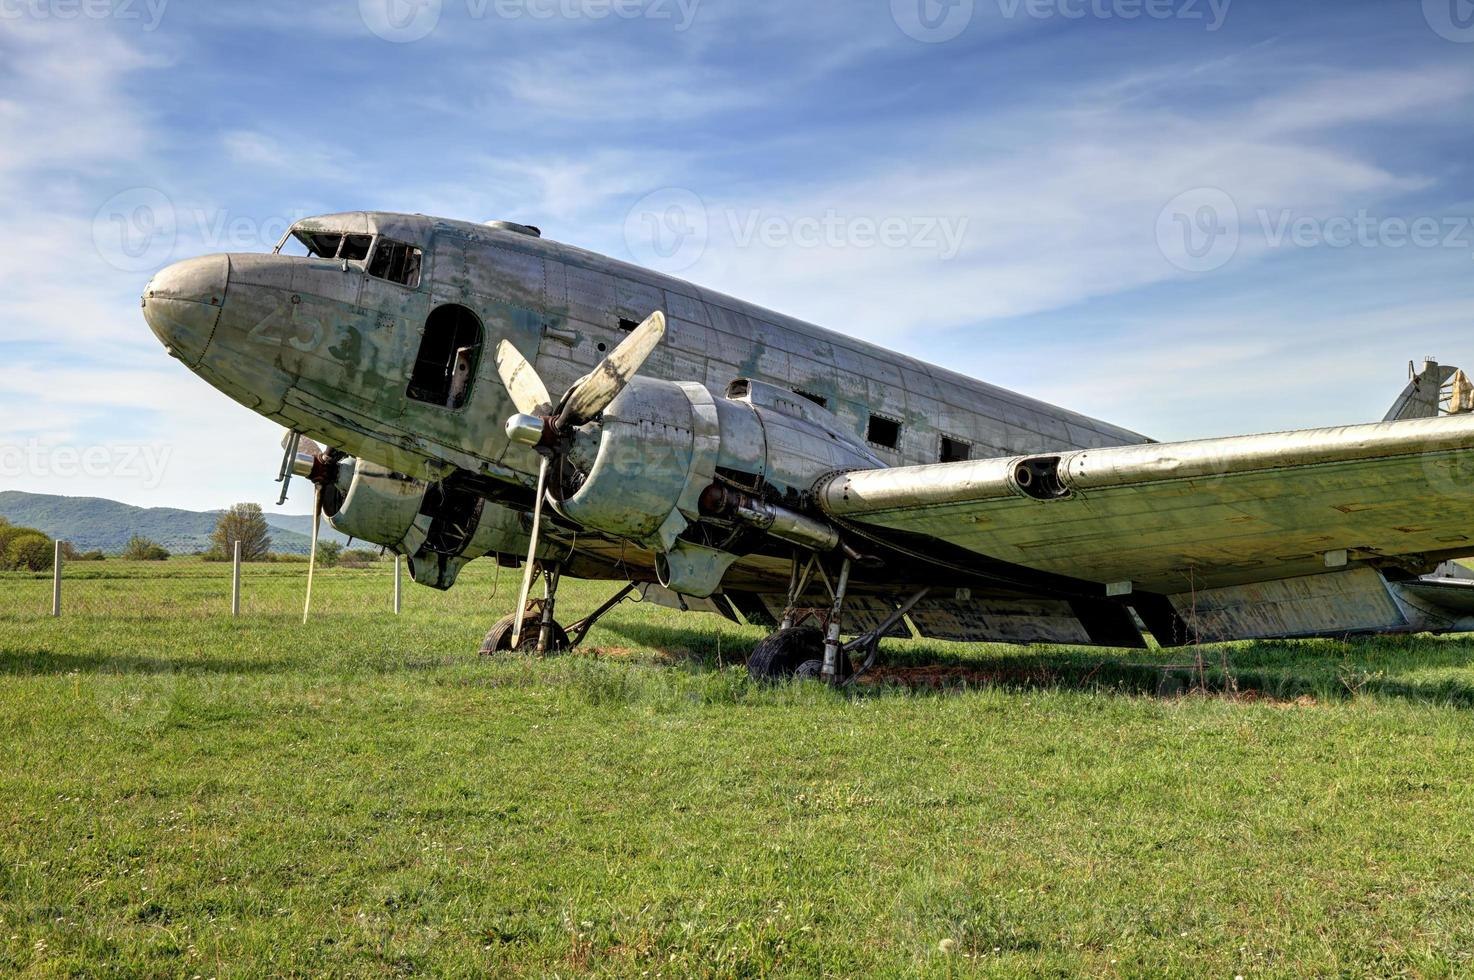 oude verlaten douglas dc-3 vliegtuig foto